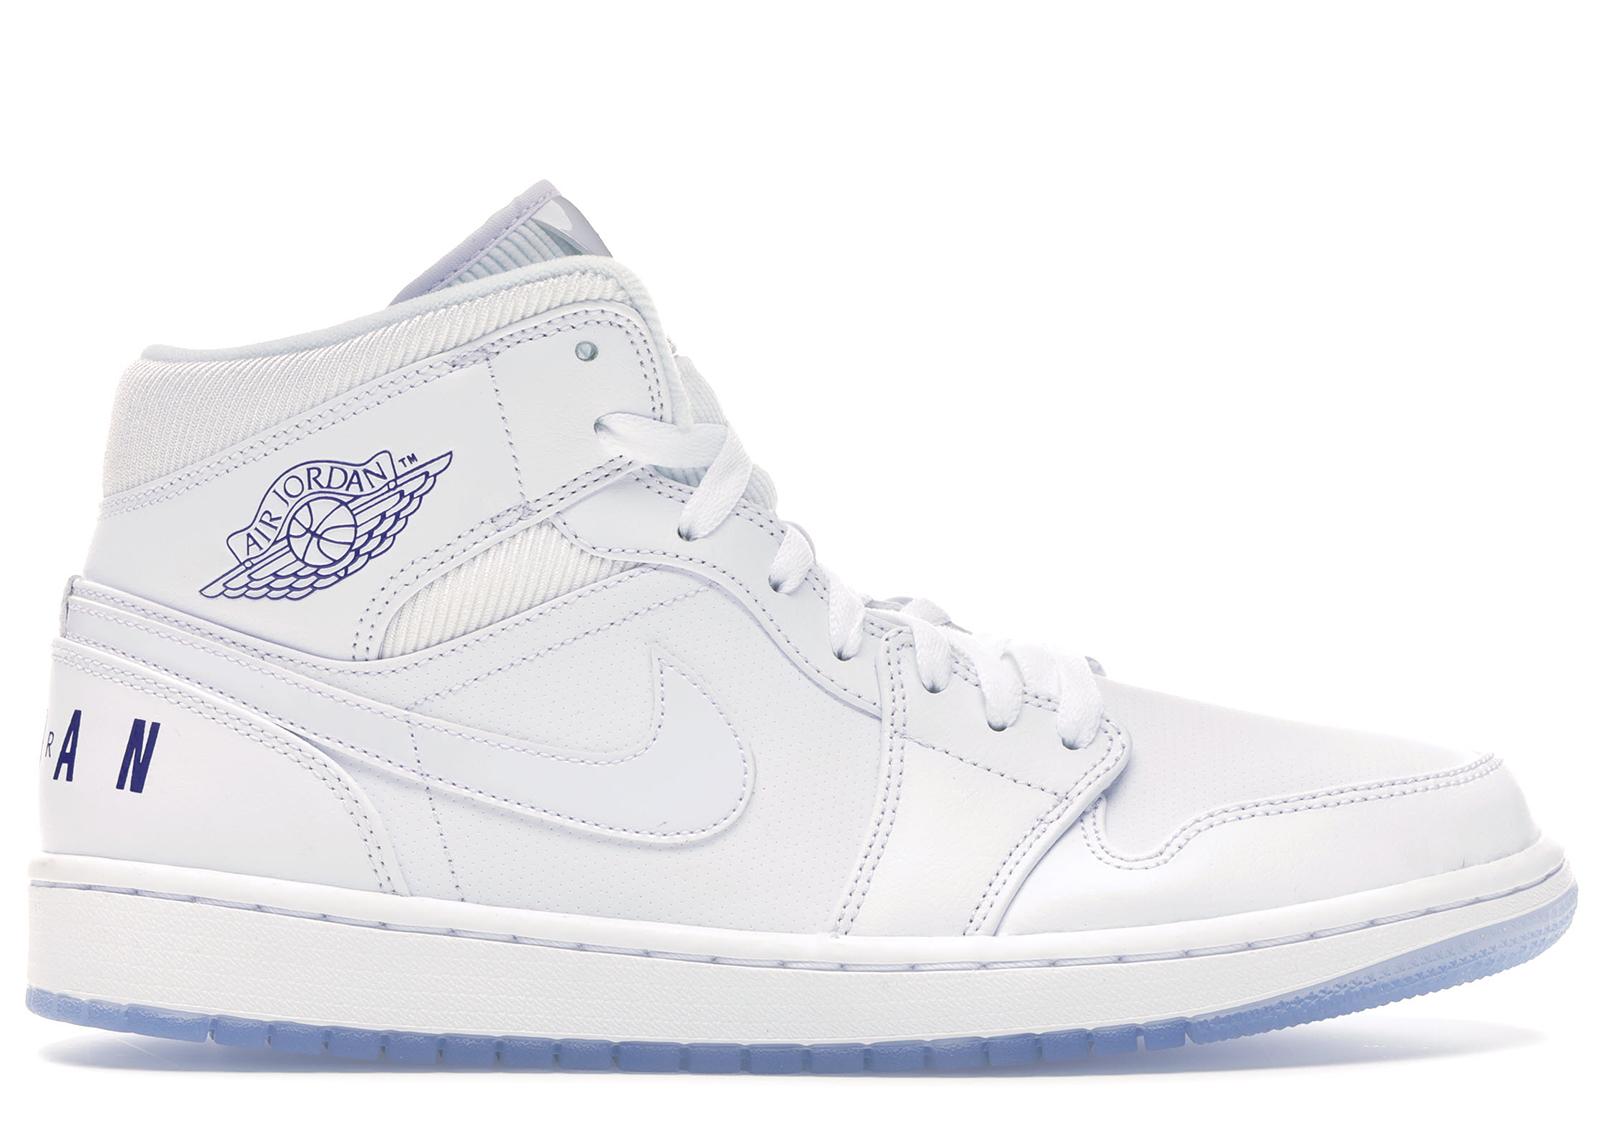 Jordan 1 Mid Pure White - BQ6578-100